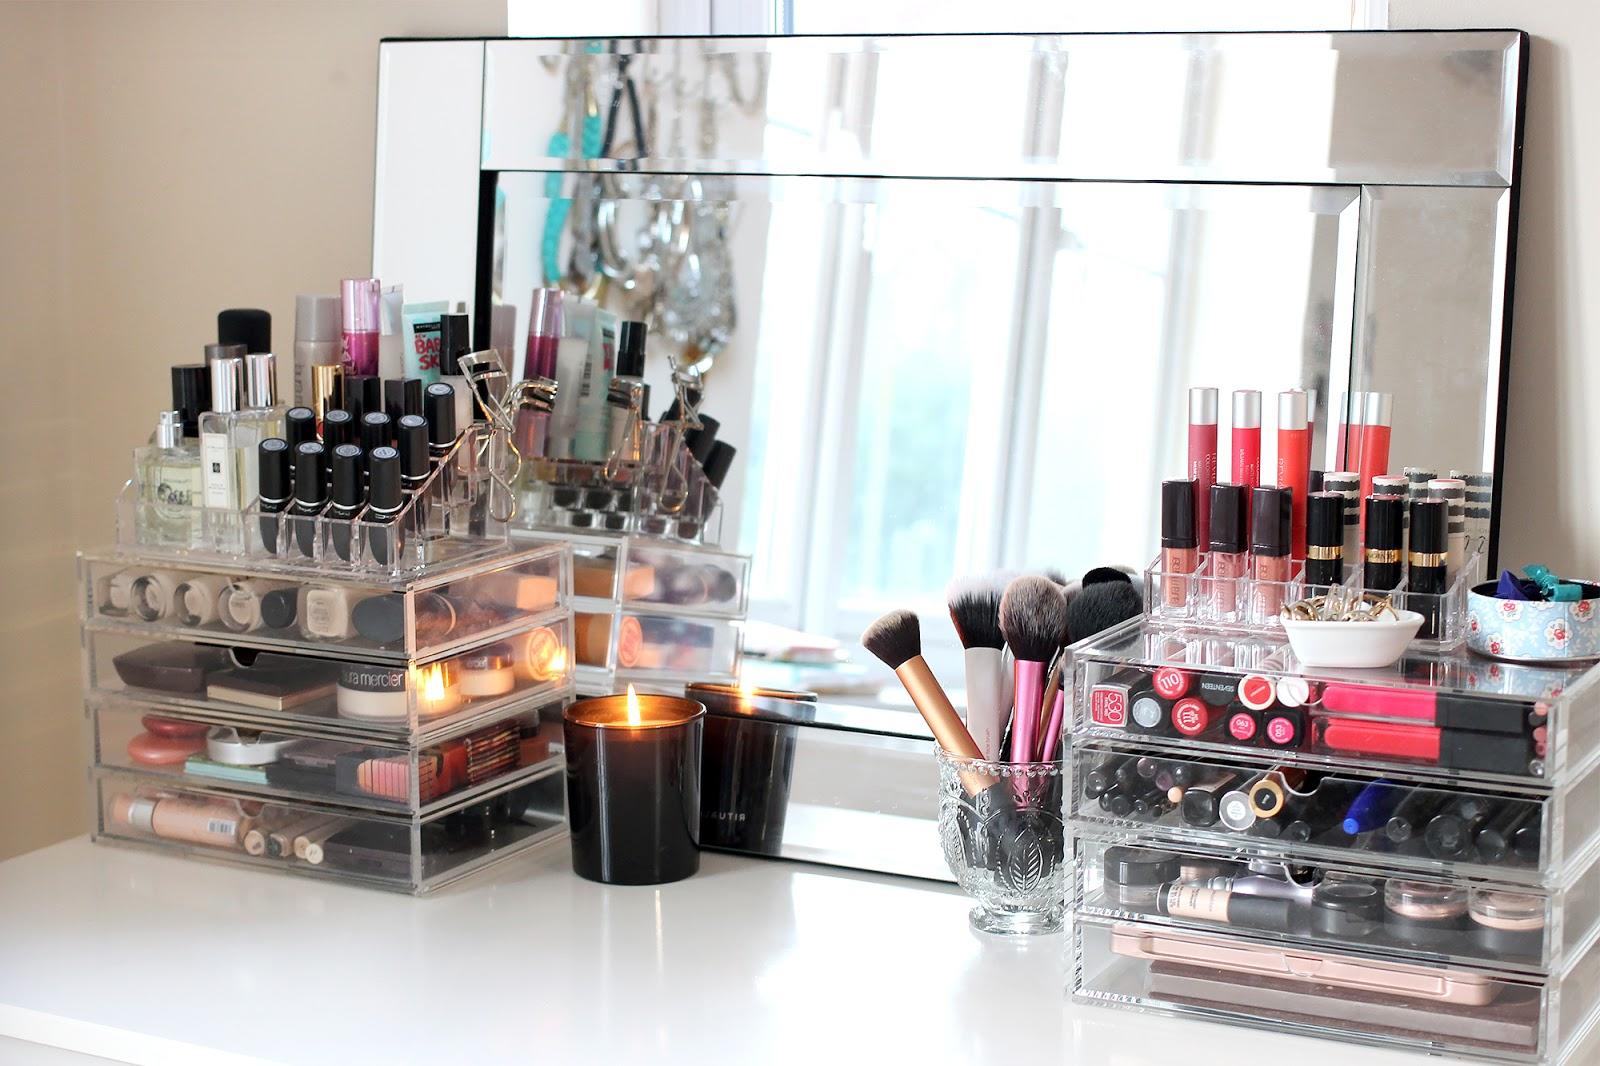 Make Up Collection Amp Storage Muji Drawer Tour I Covet Thee